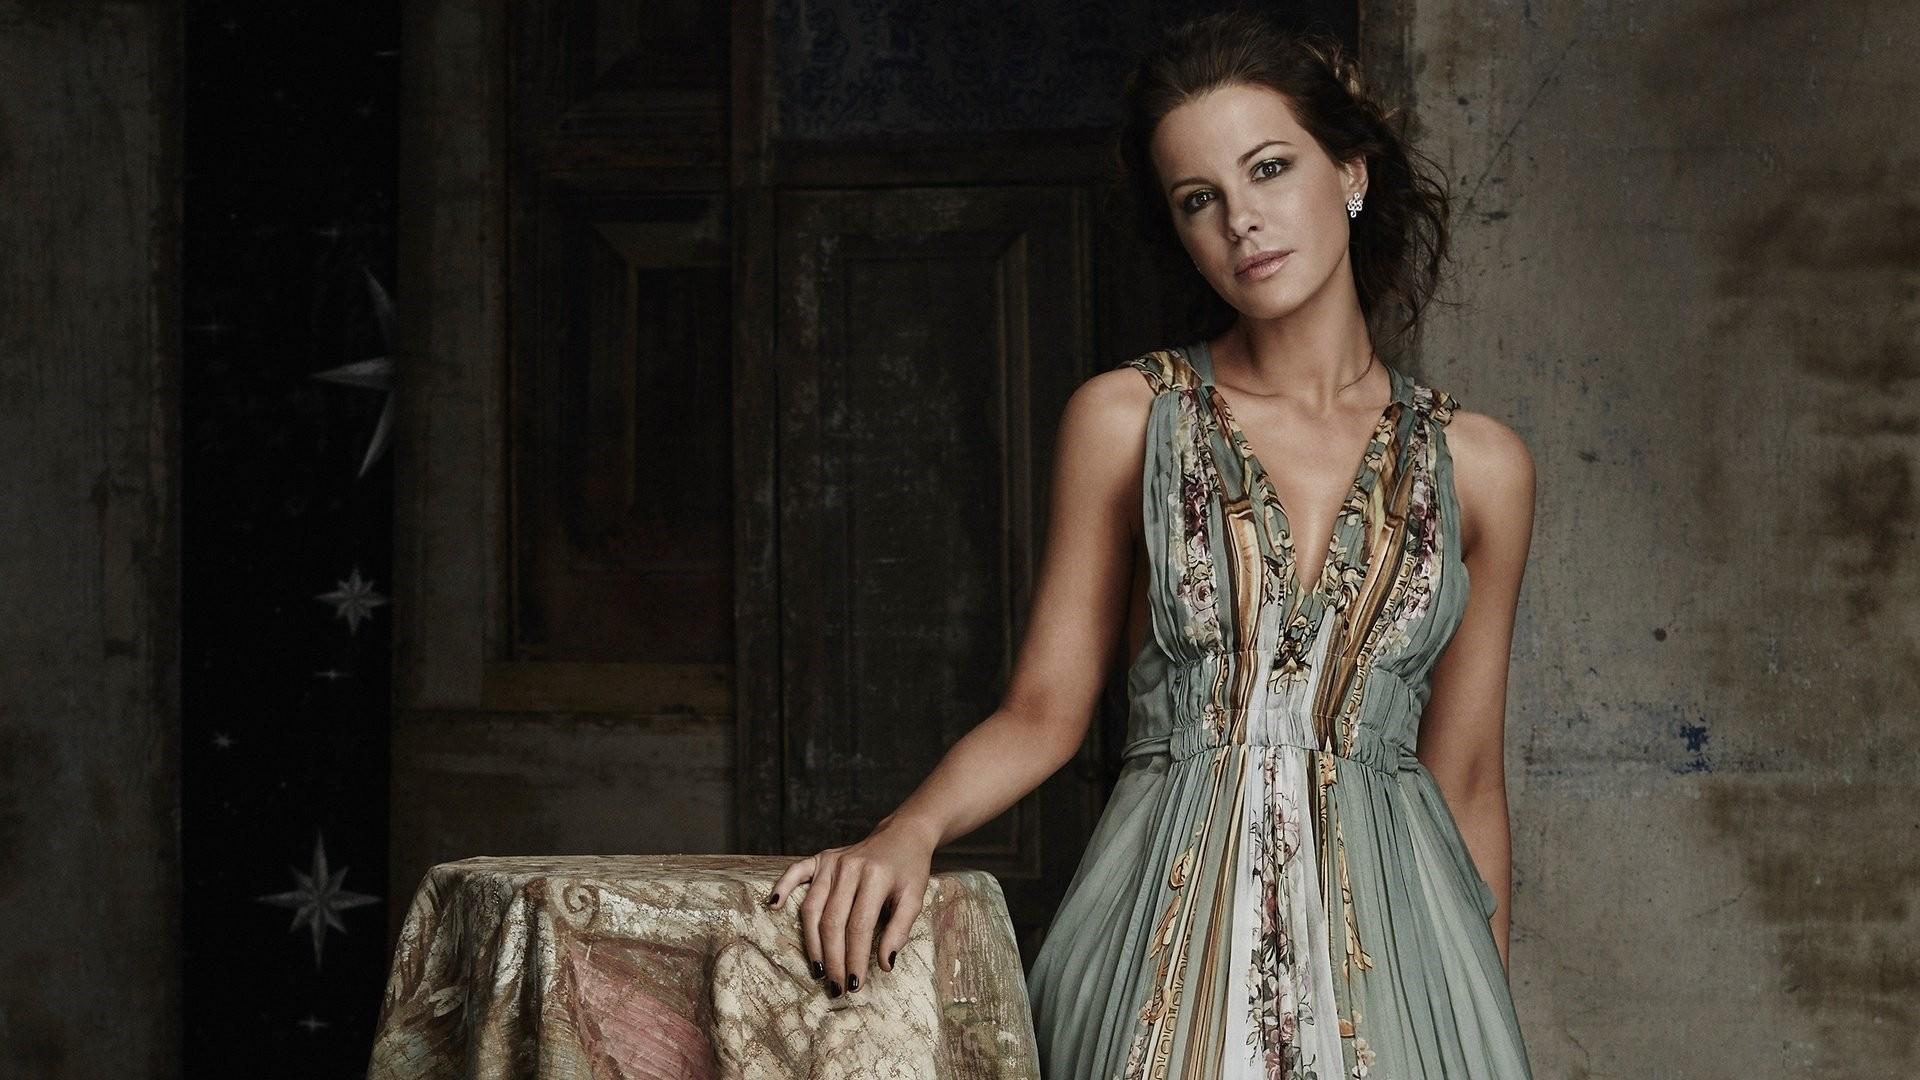 Kate Beckinsale Wallpaper Image